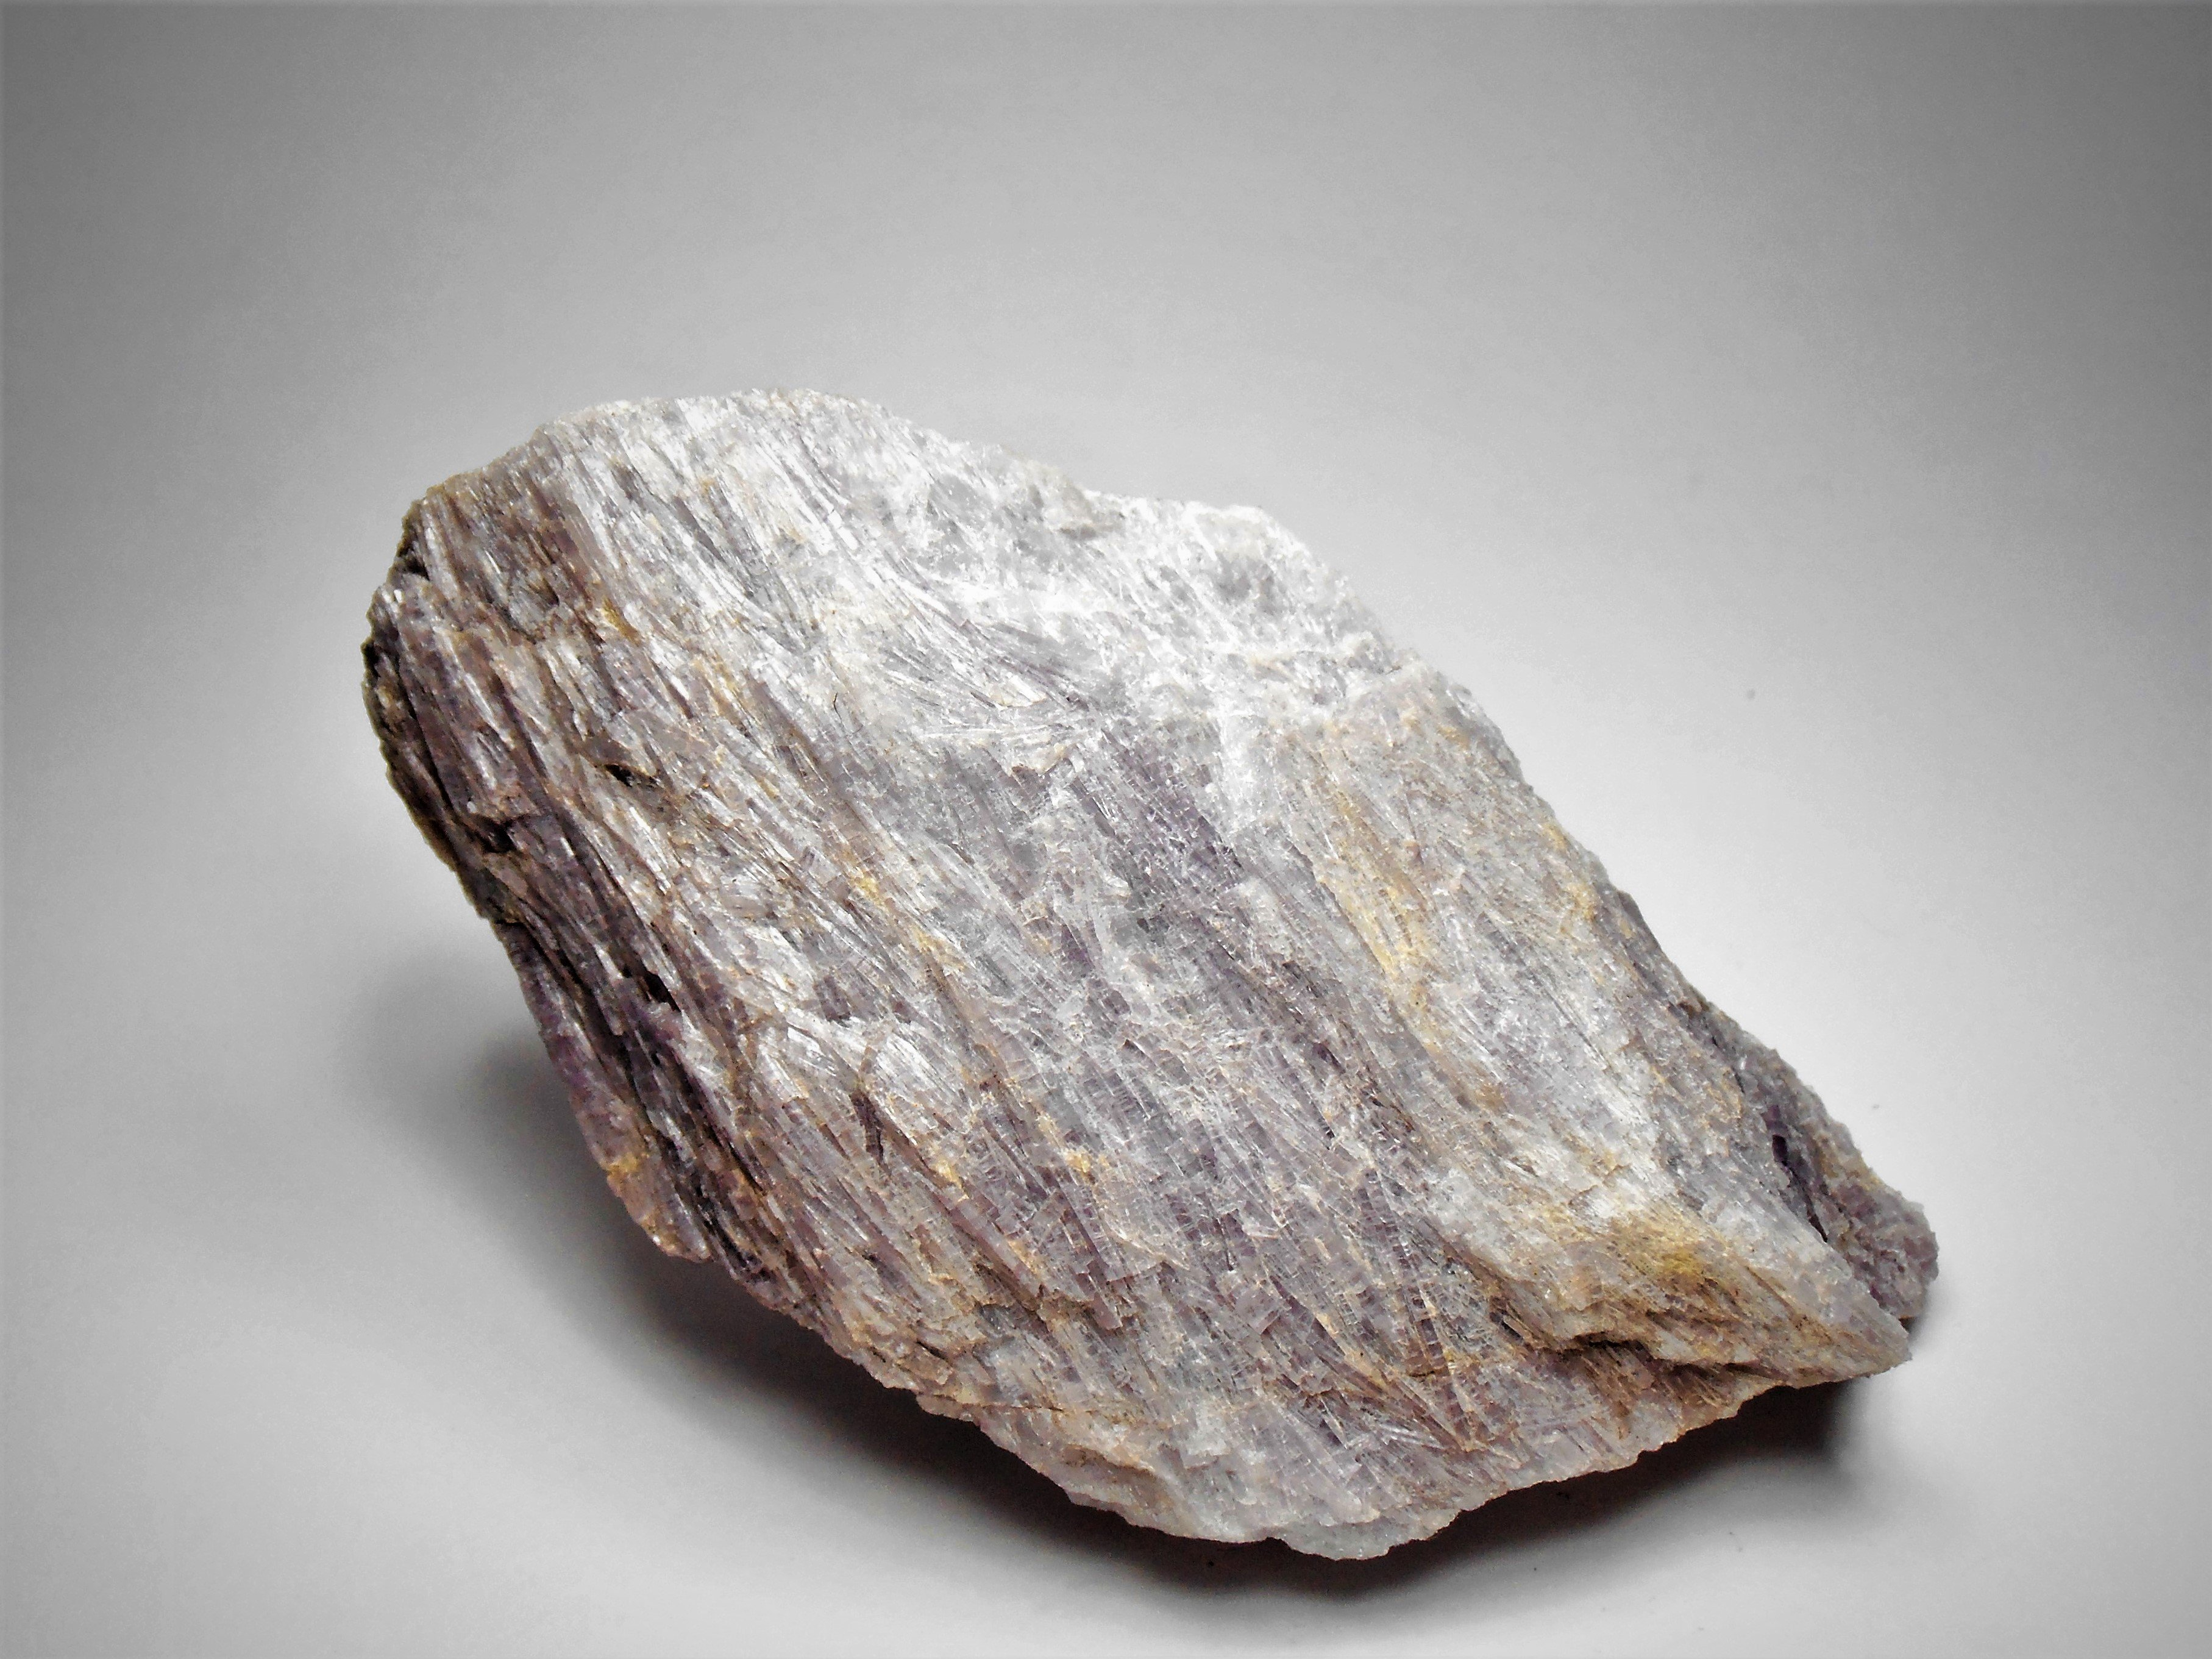 Hexagonite - The Manganese rich variety of Tremolite